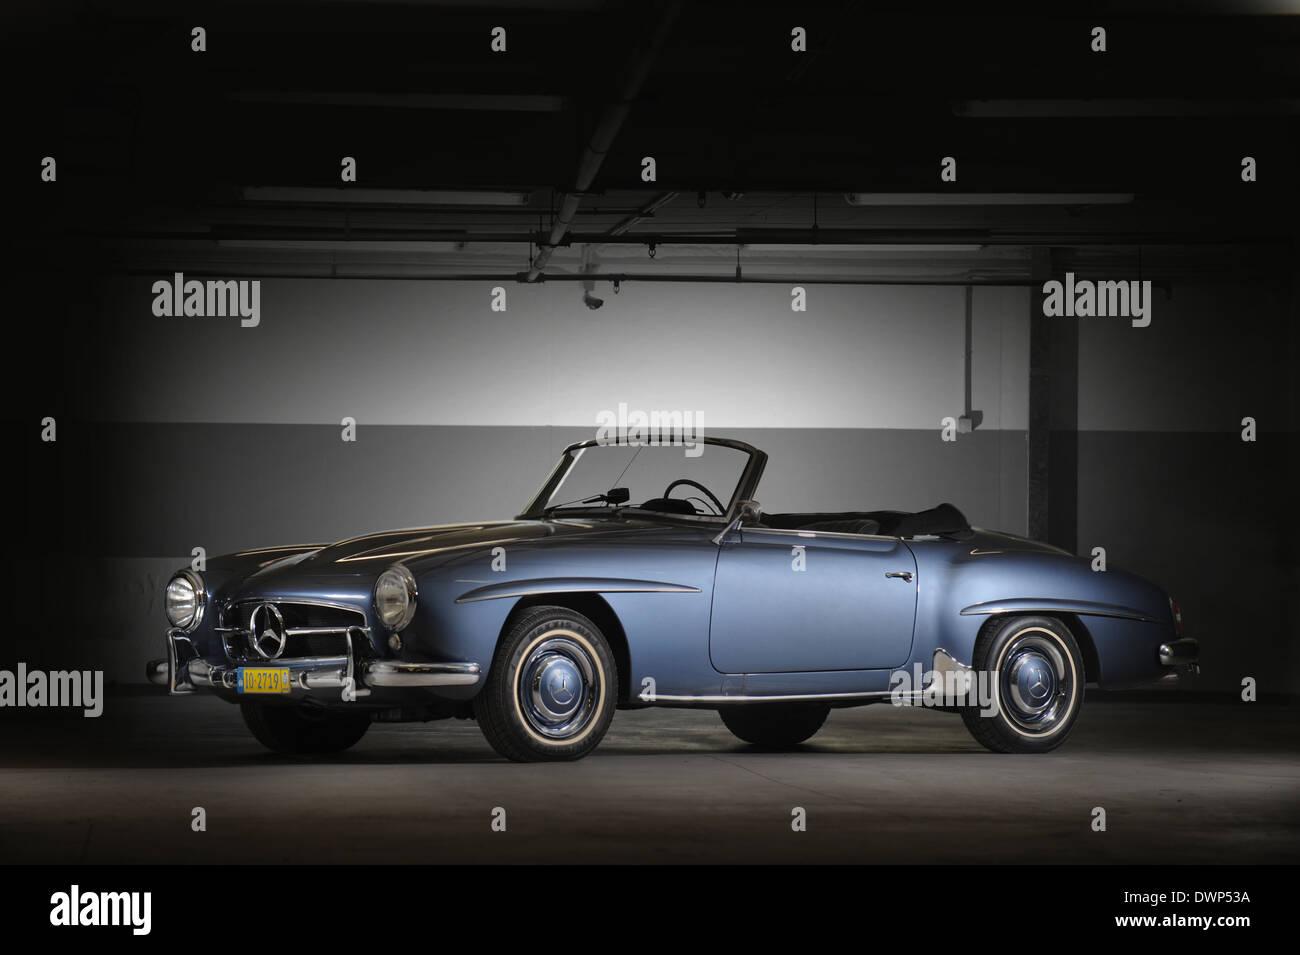 1962 Mercedes-Benz 190 SL Roadster - Stock Image